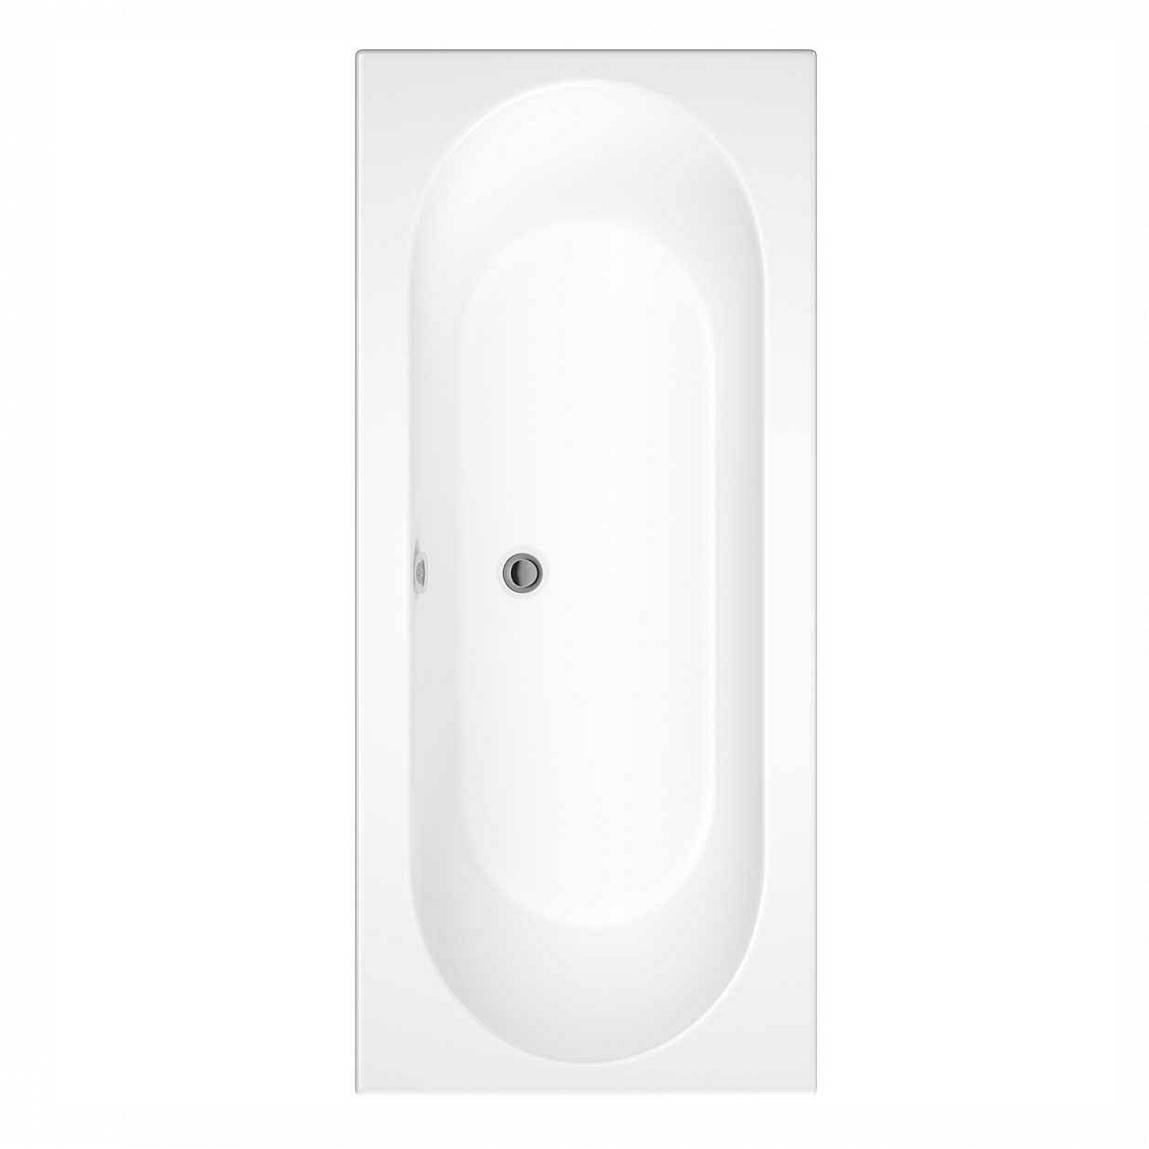 Image of Islington Bath 1700 x 750